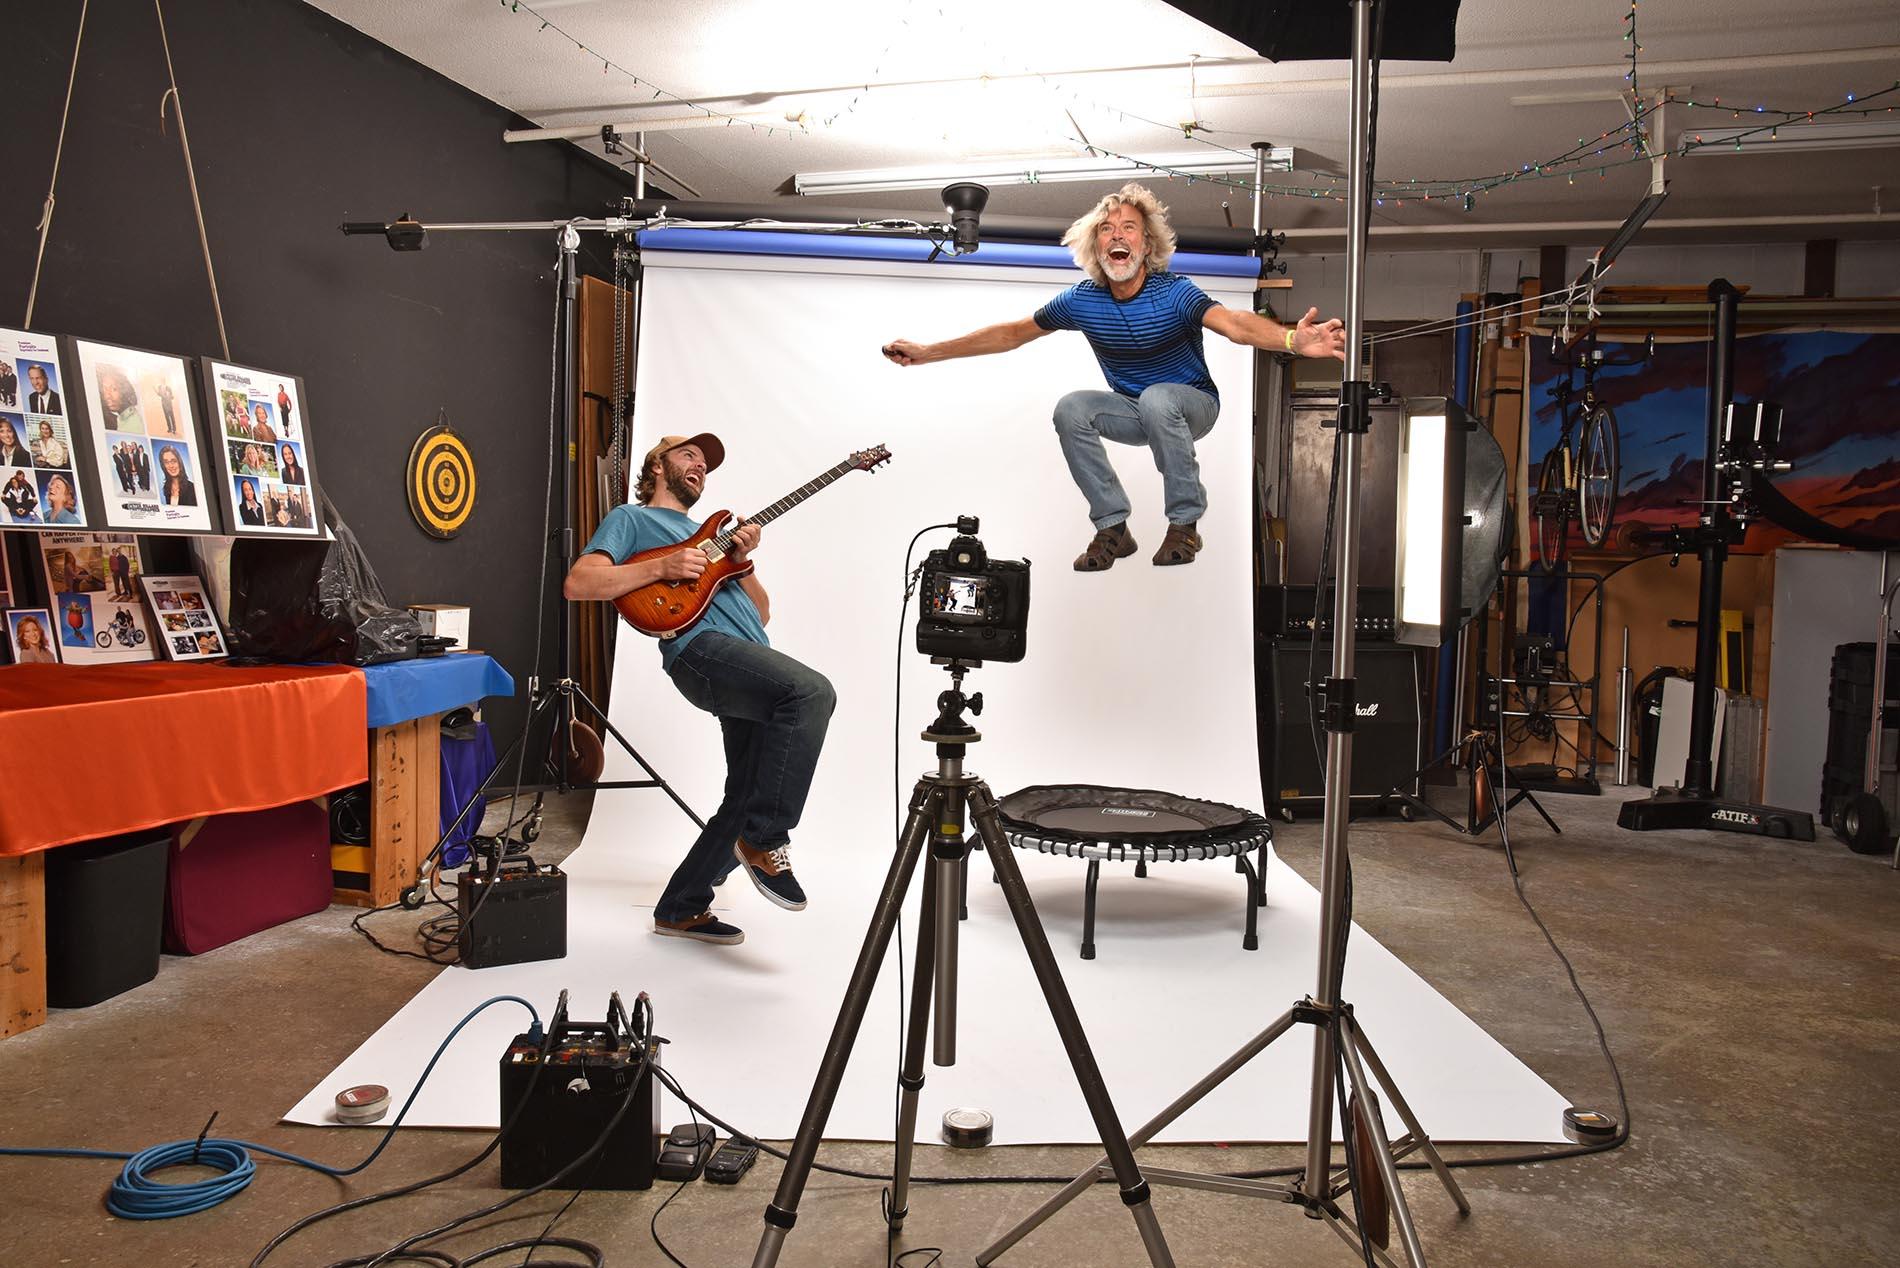 Studio behind the scenes guitar and trampoline